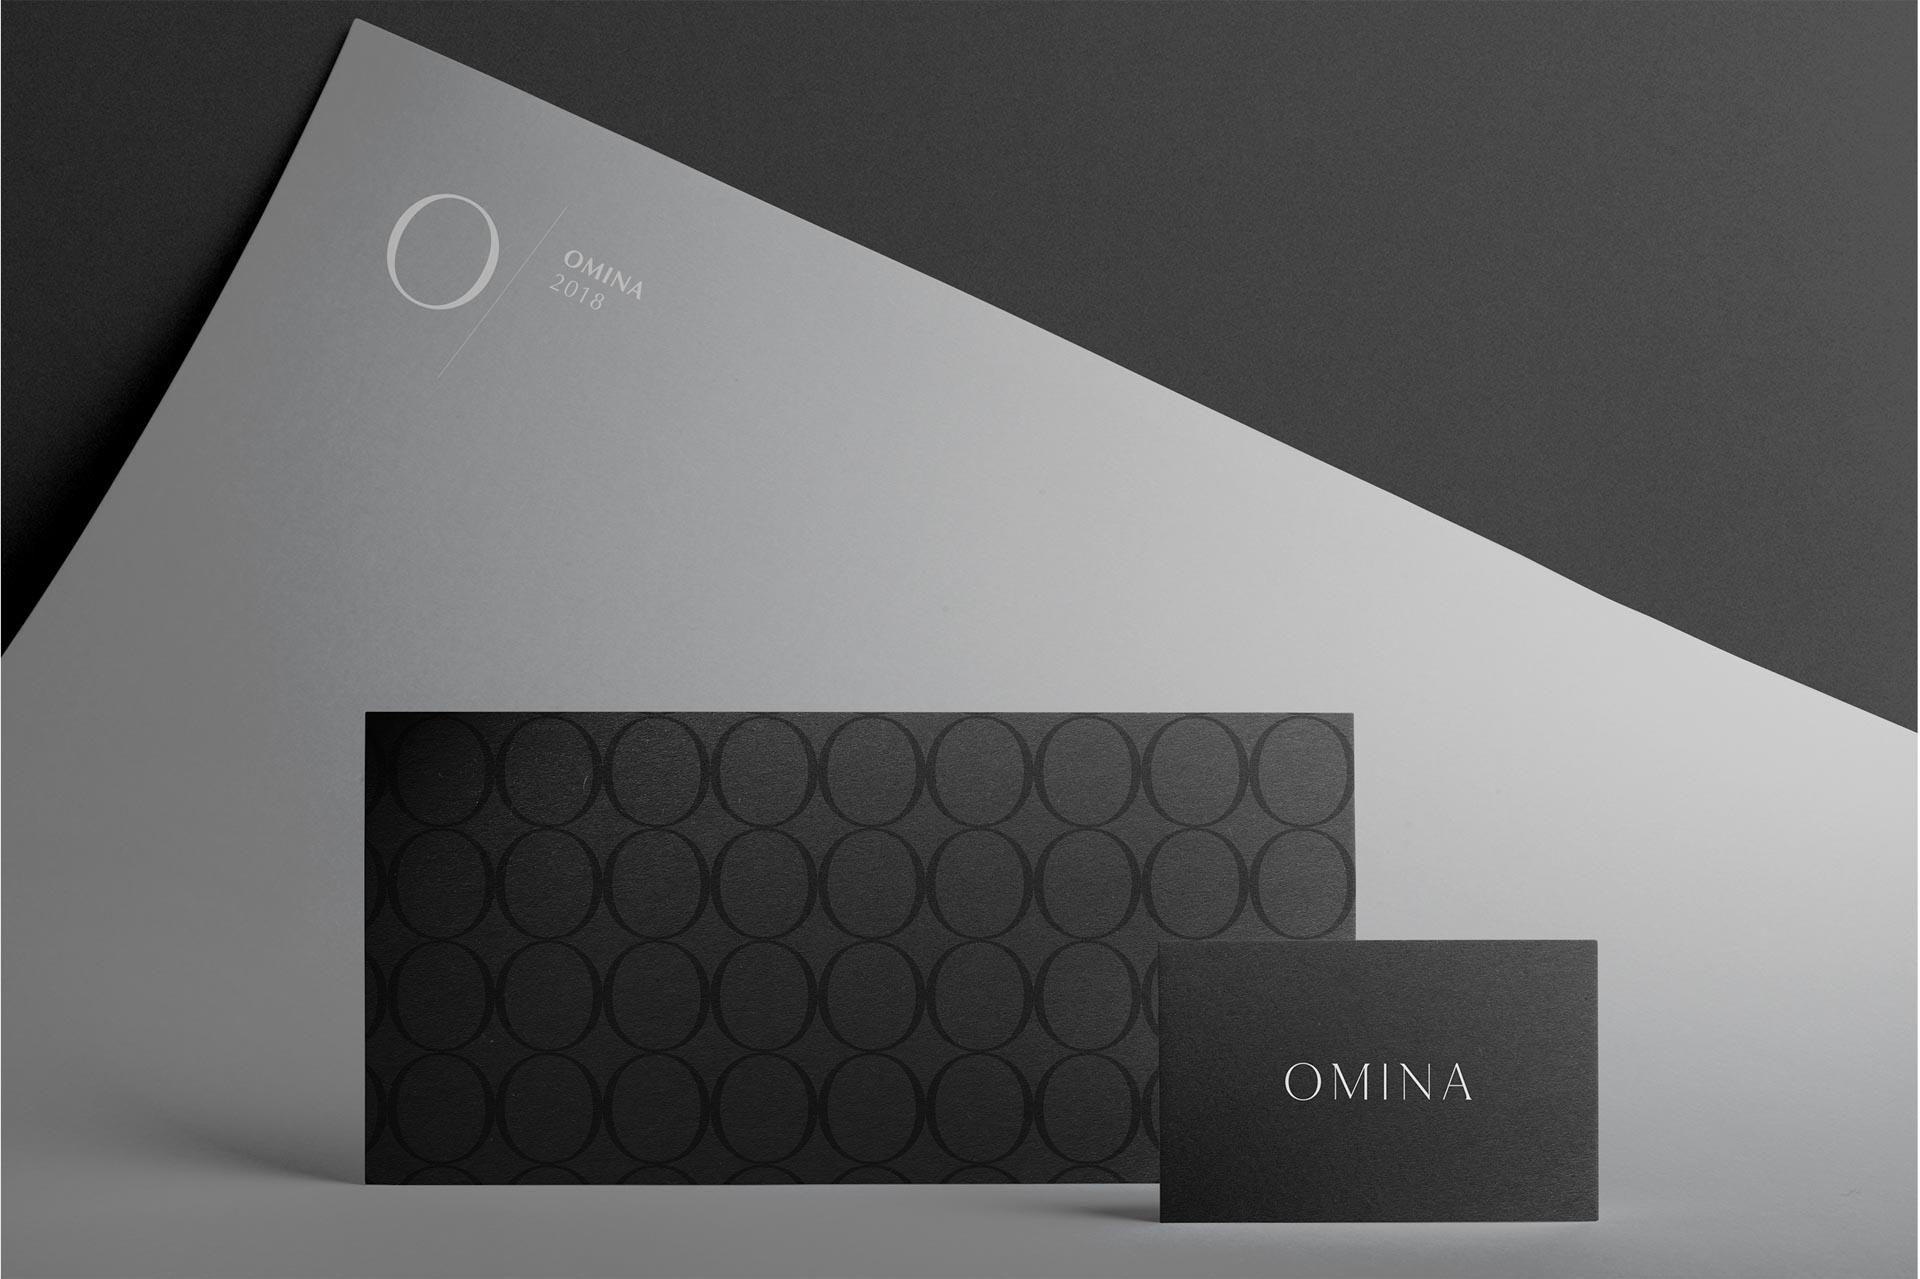 OMINA FOUNDATION